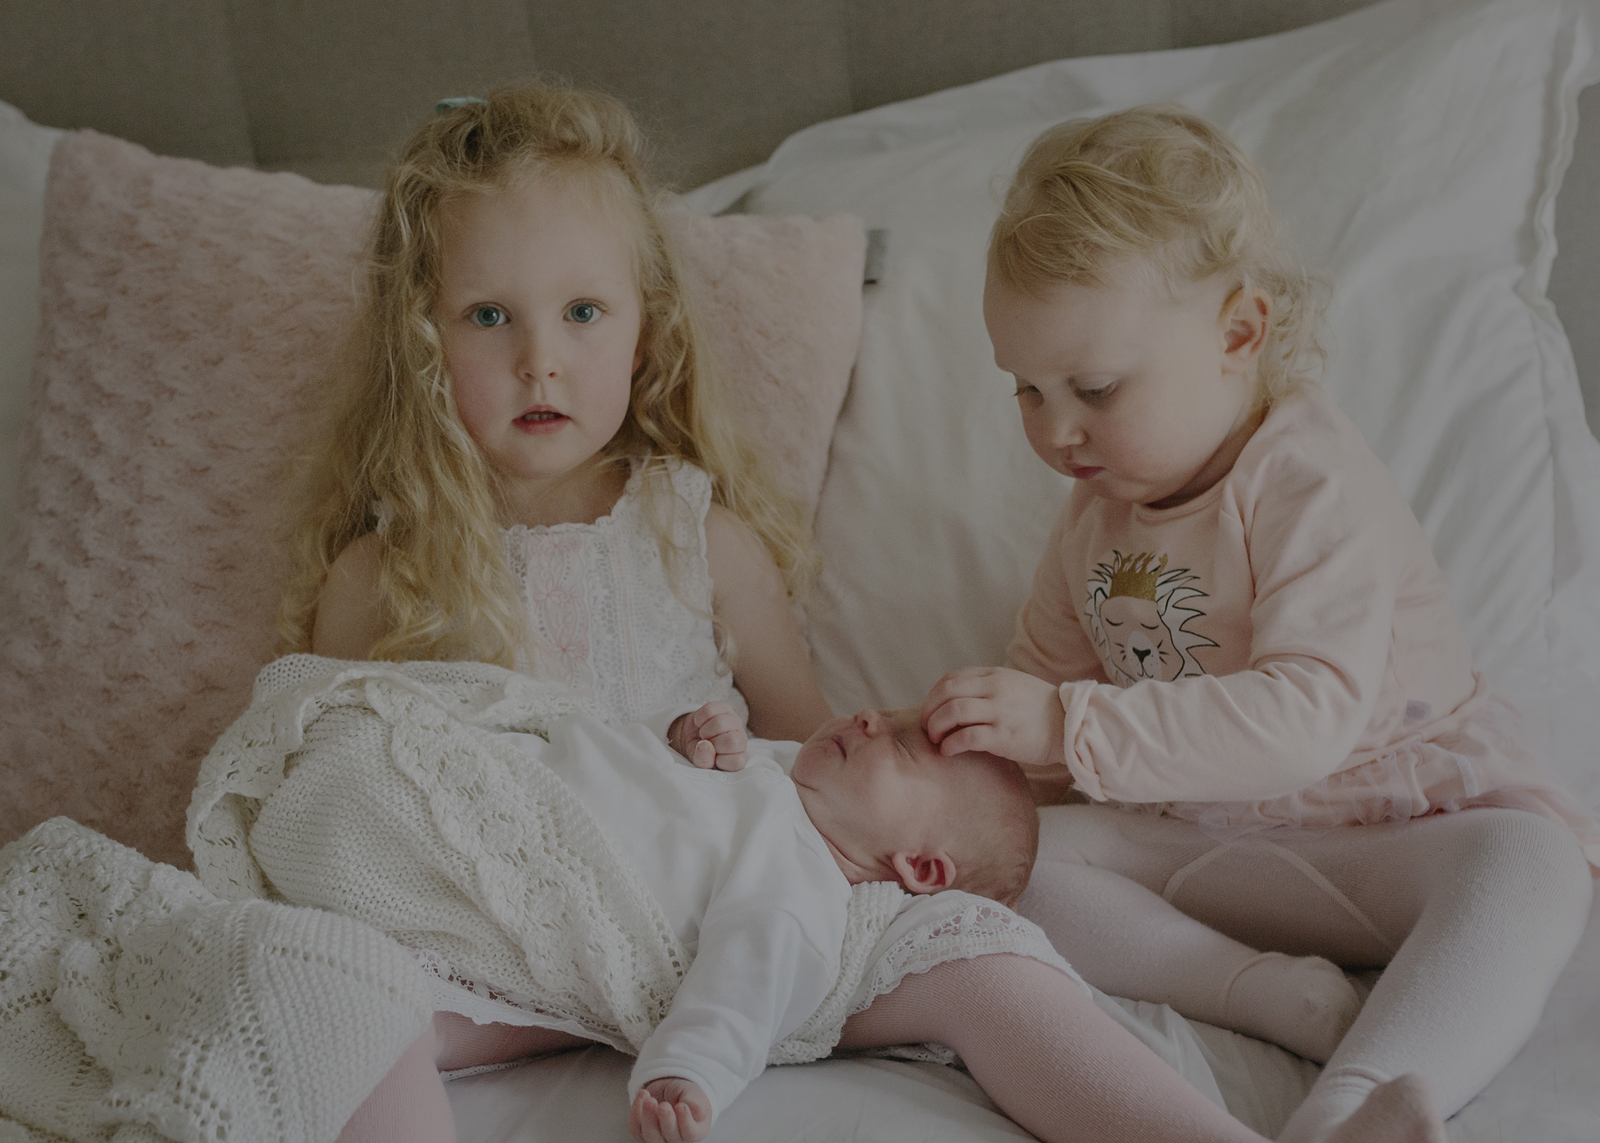 Loves for their newborn baby sister